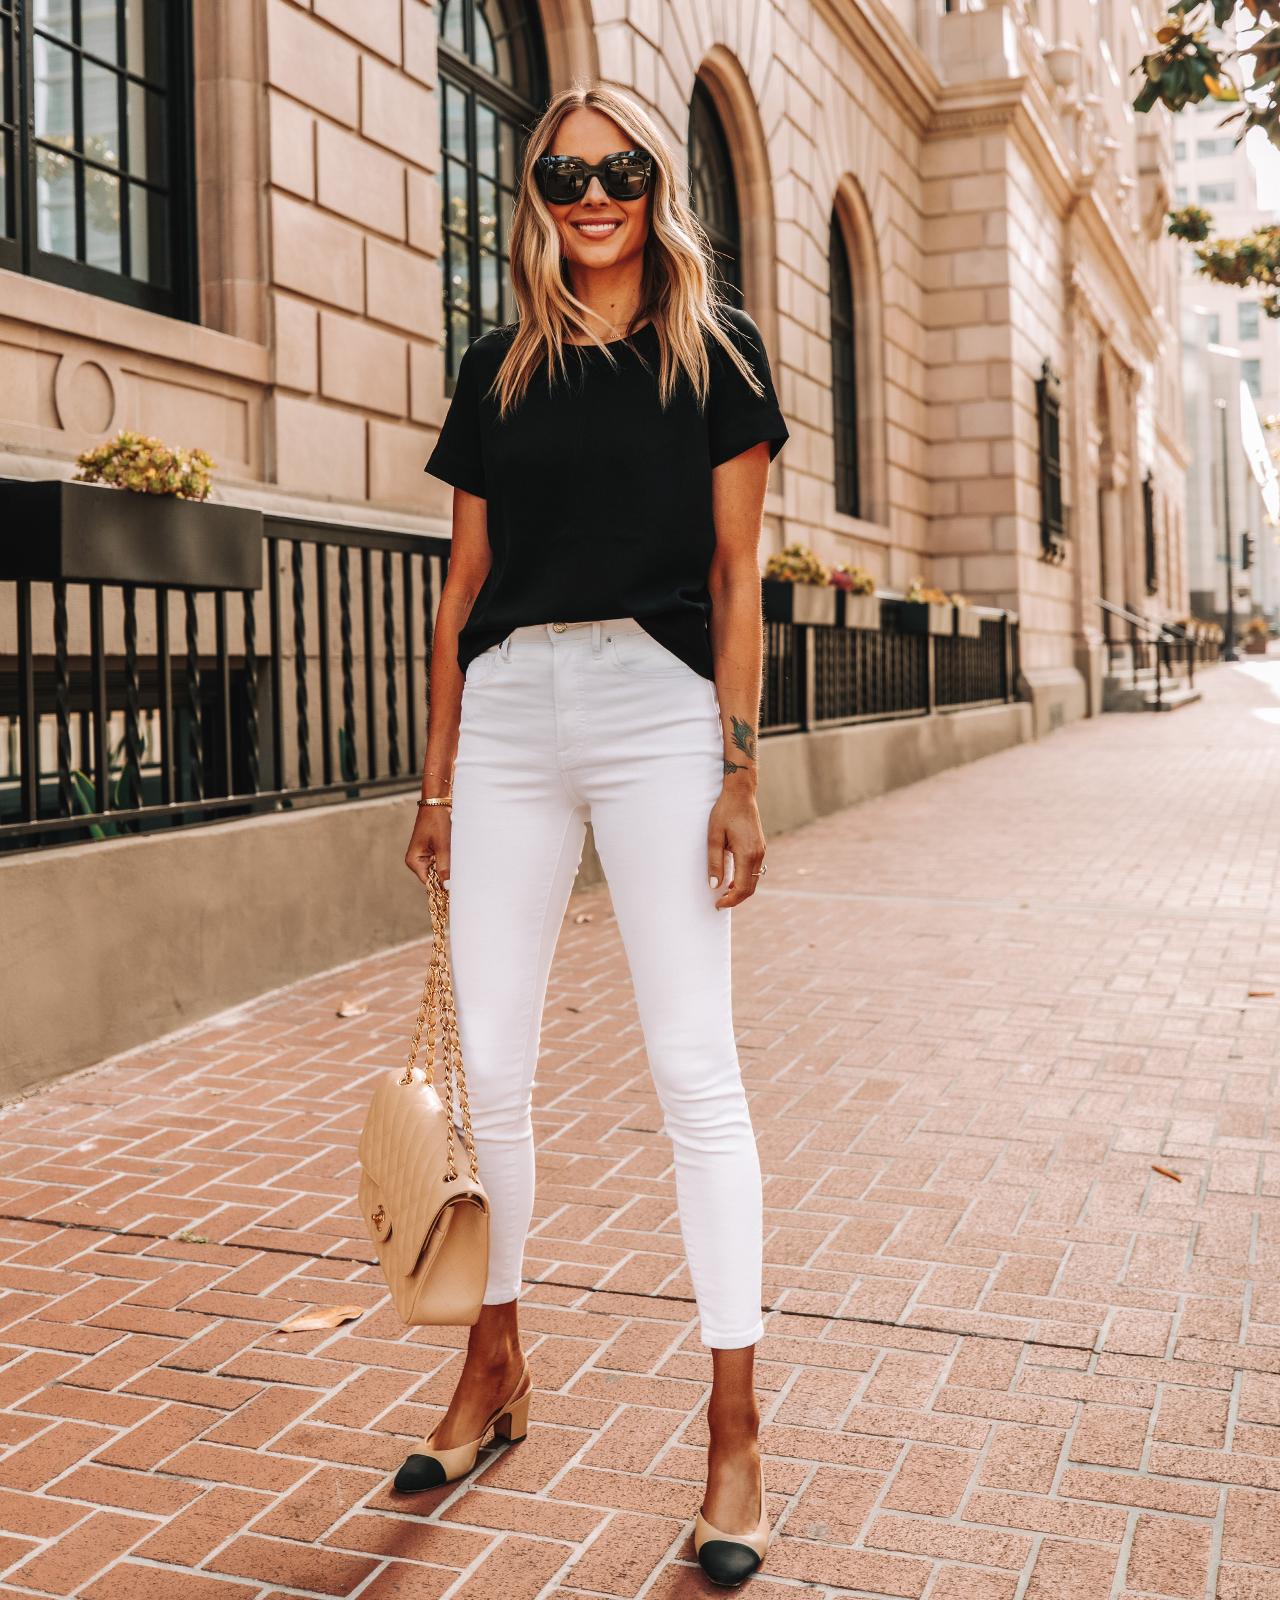 Fashion Jackson Wearing Everlane Black Top Everlane White Skinny Jeans Chanel Slingbacks